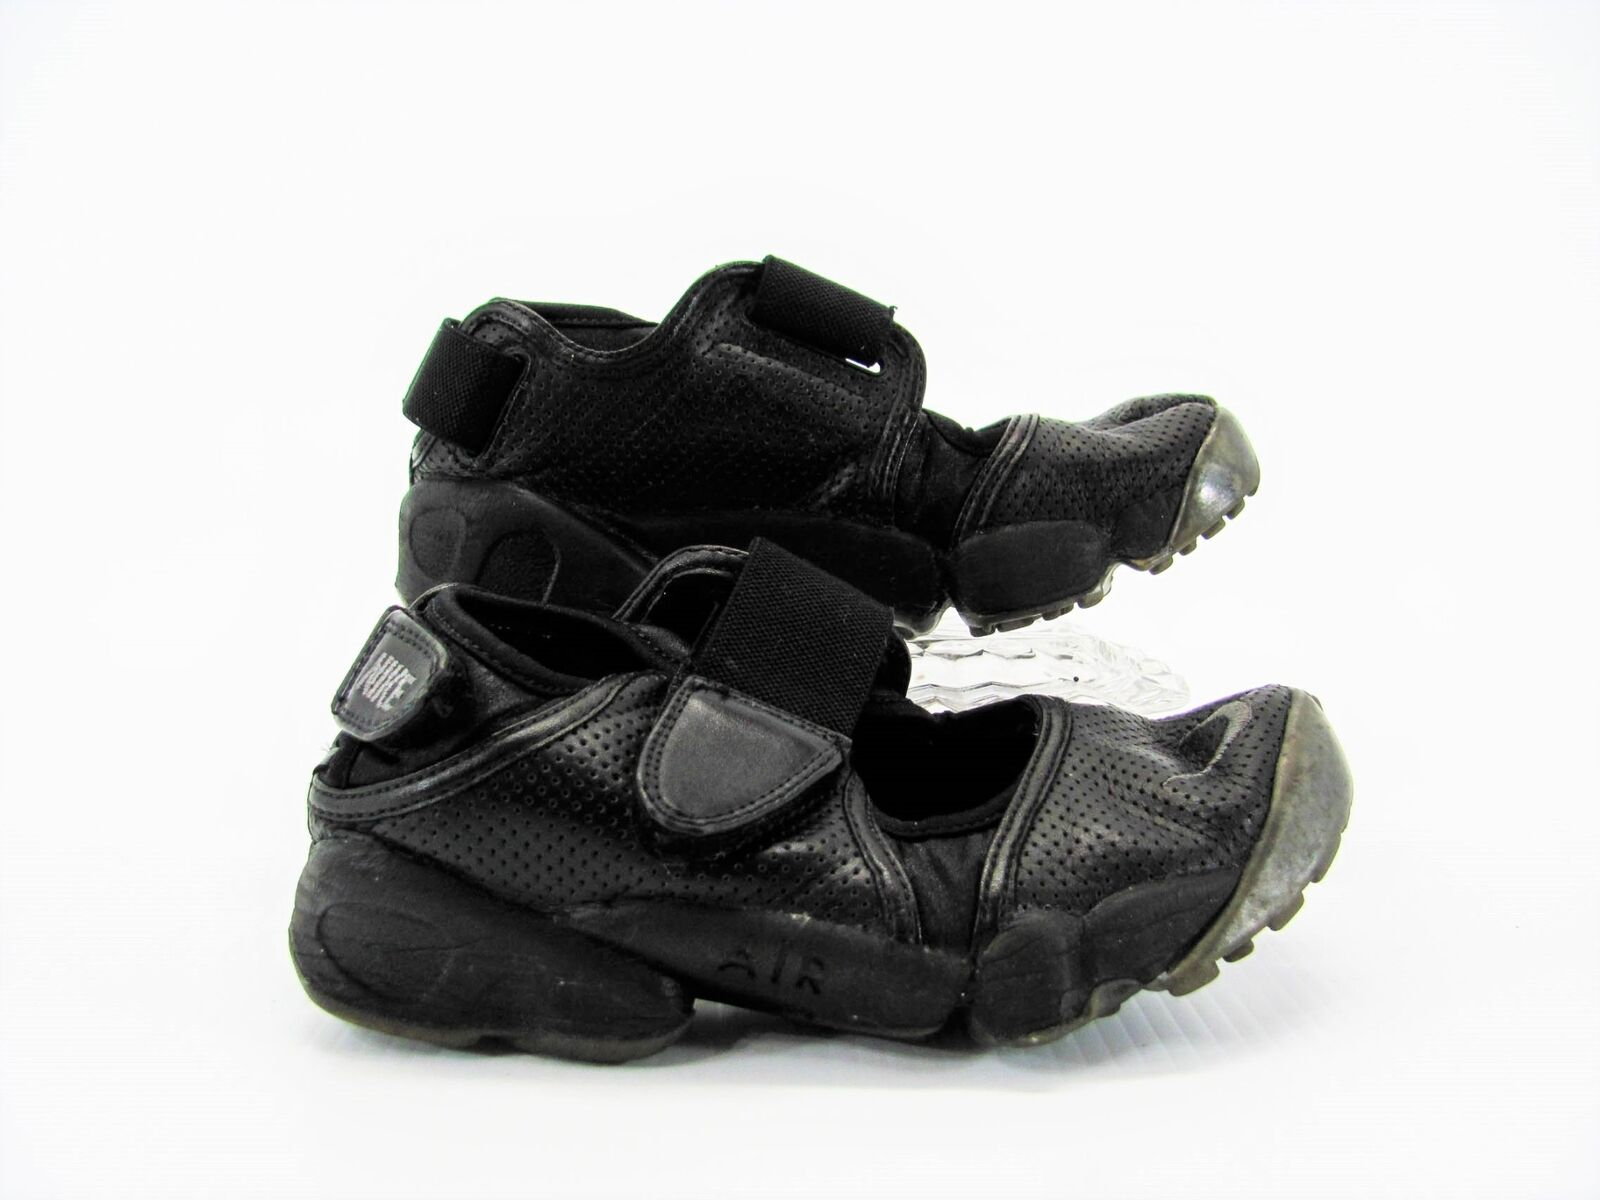 Nike Air Rift Women Black Split Toe Shoe 6M Pre Owned GQ